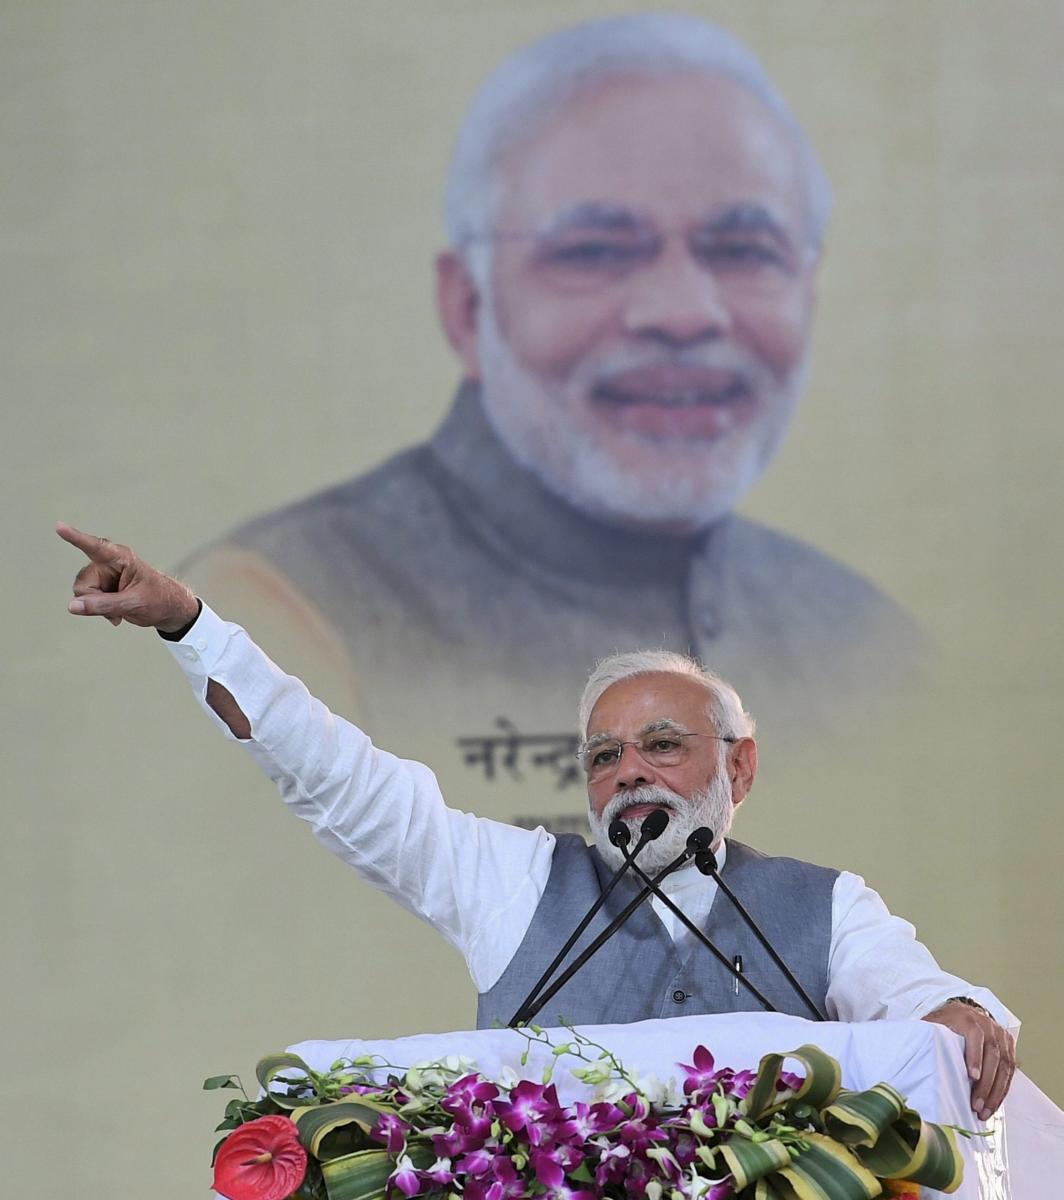 Prime Minister Narendra Modi addresses a public rally, in Ghaziabad, Friday, March 8, 2019. (PIB/PTI Photo)